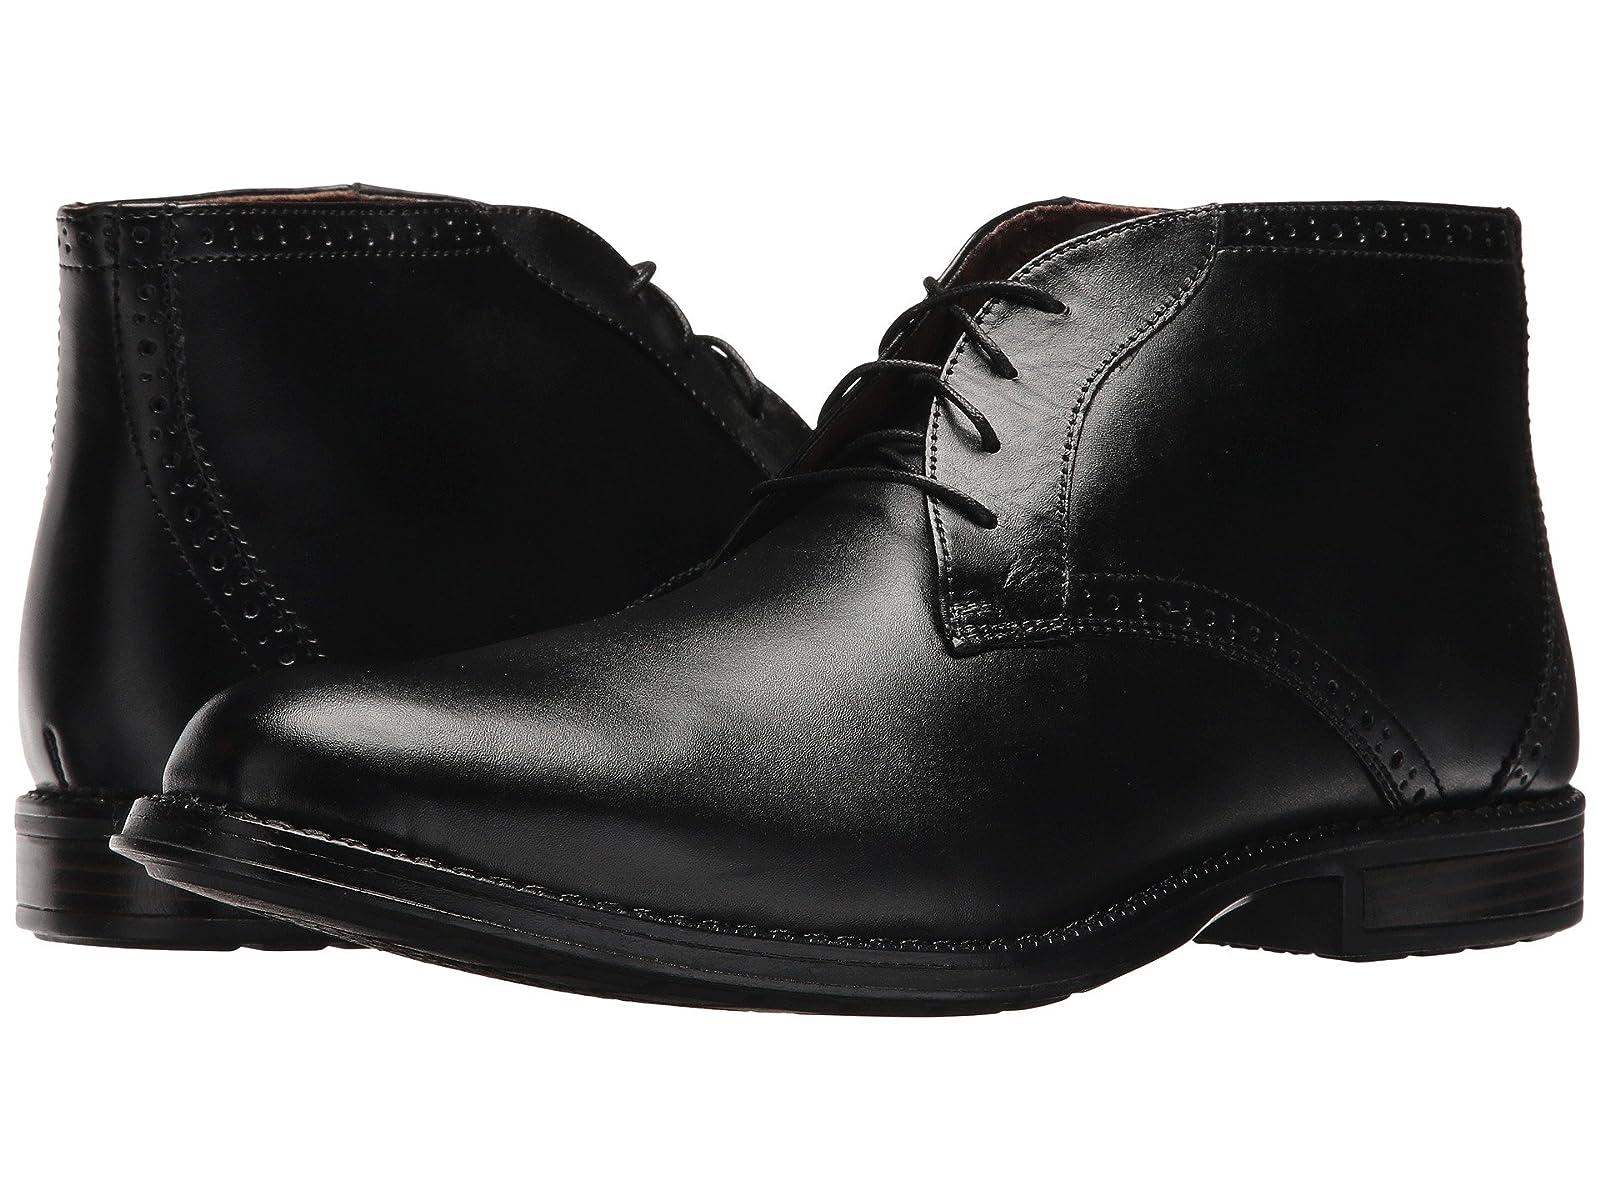 Nunn Bush RussellCheap and distinctive eye-catching shoes